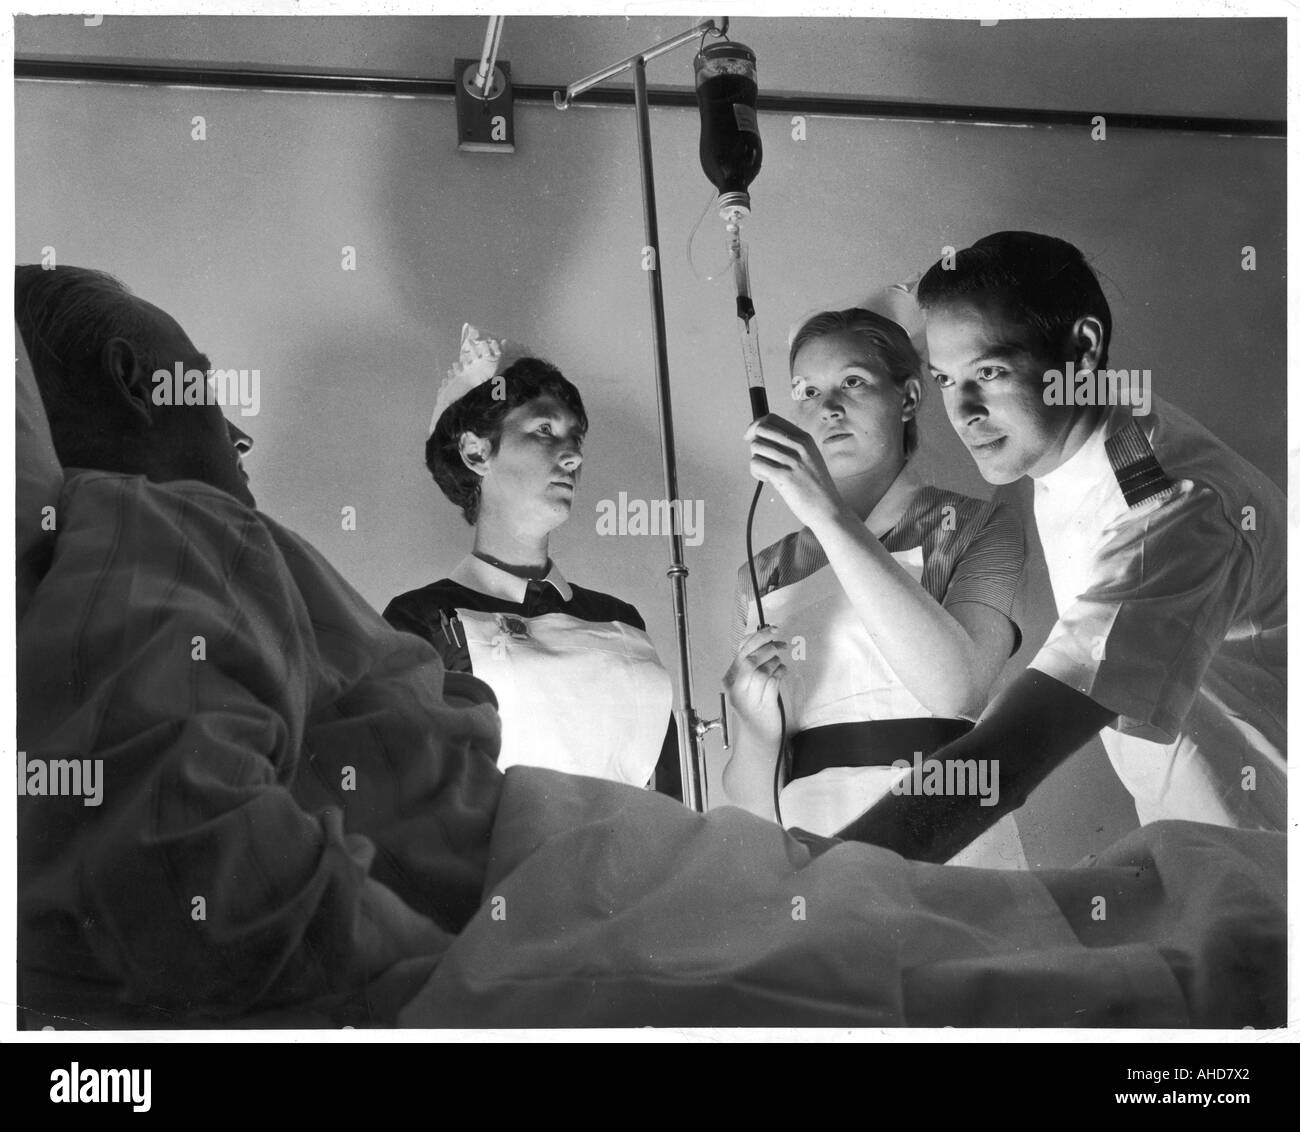 Blood Transfusion 1966 - Stock Image